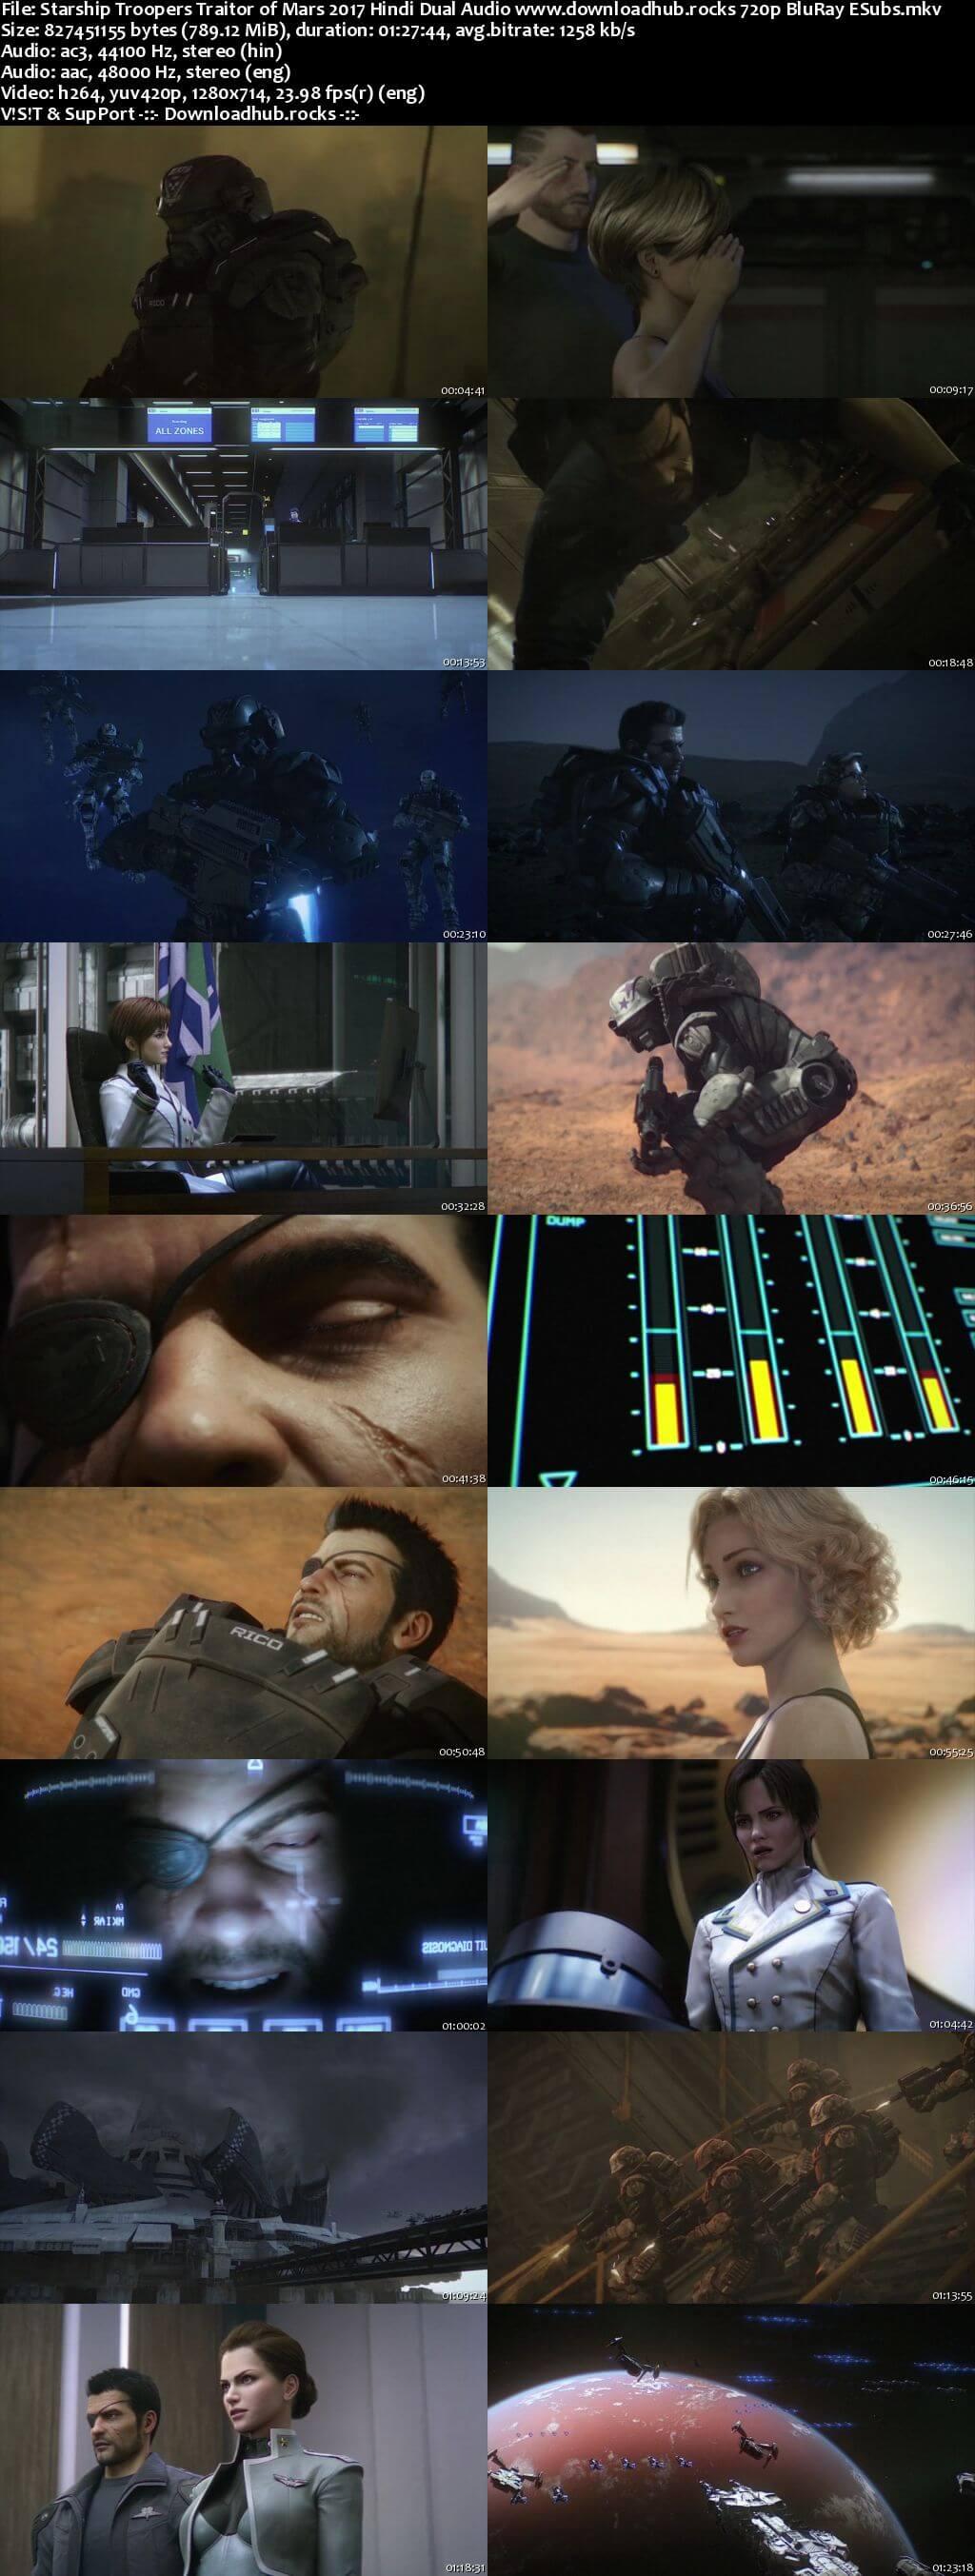 Starship Troopers Traitor of Mars 2017 Hindi Dual Audio 720p BluRay ESubs